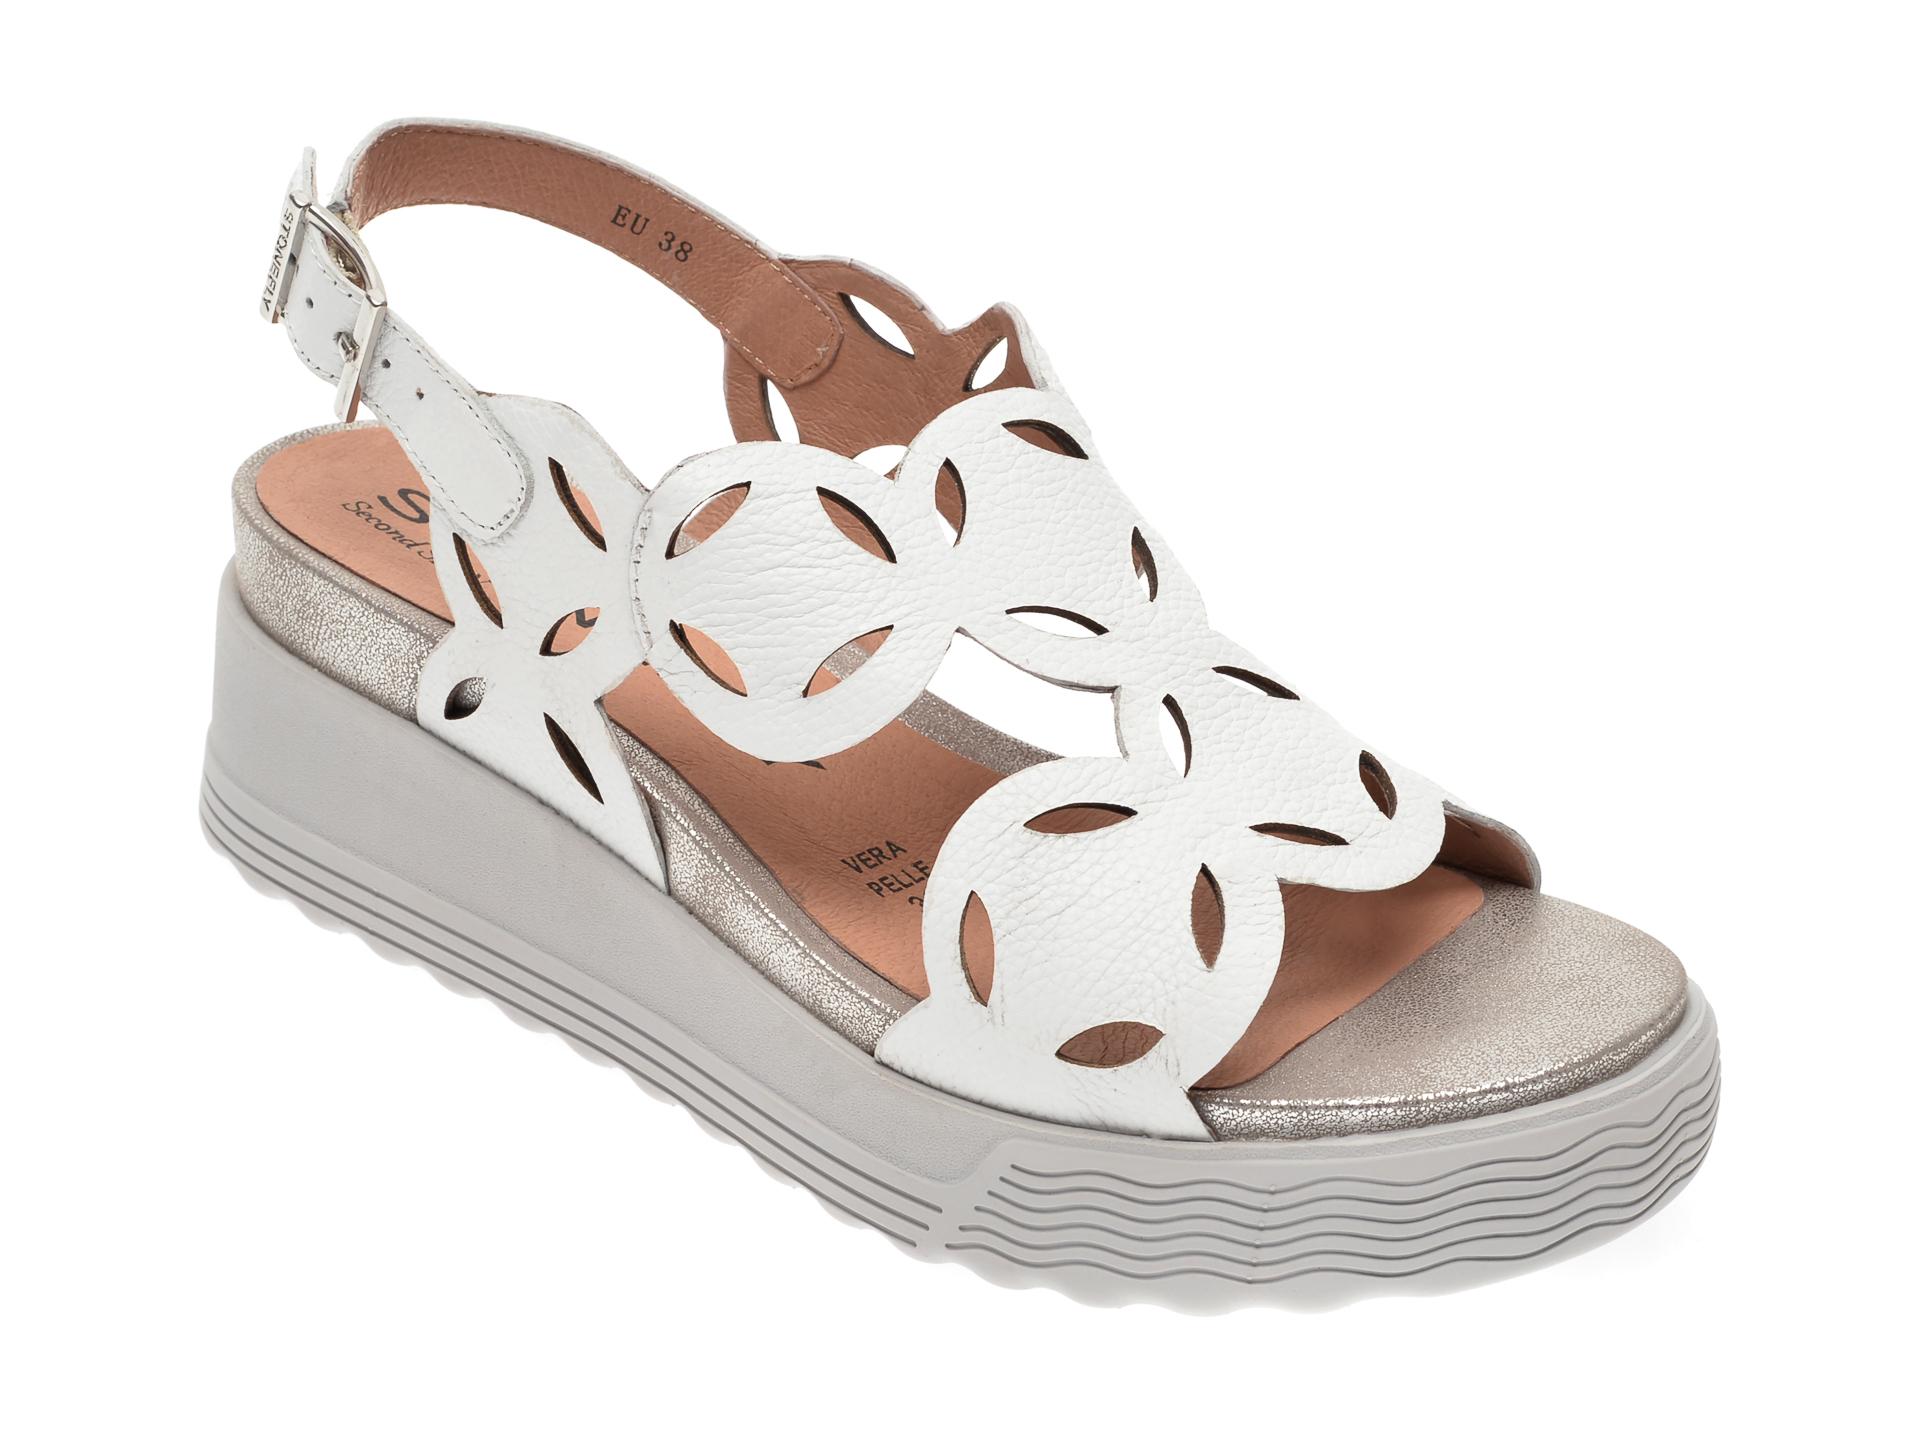 Sandale STONEFLY albe, ELODY9, din piele naturala